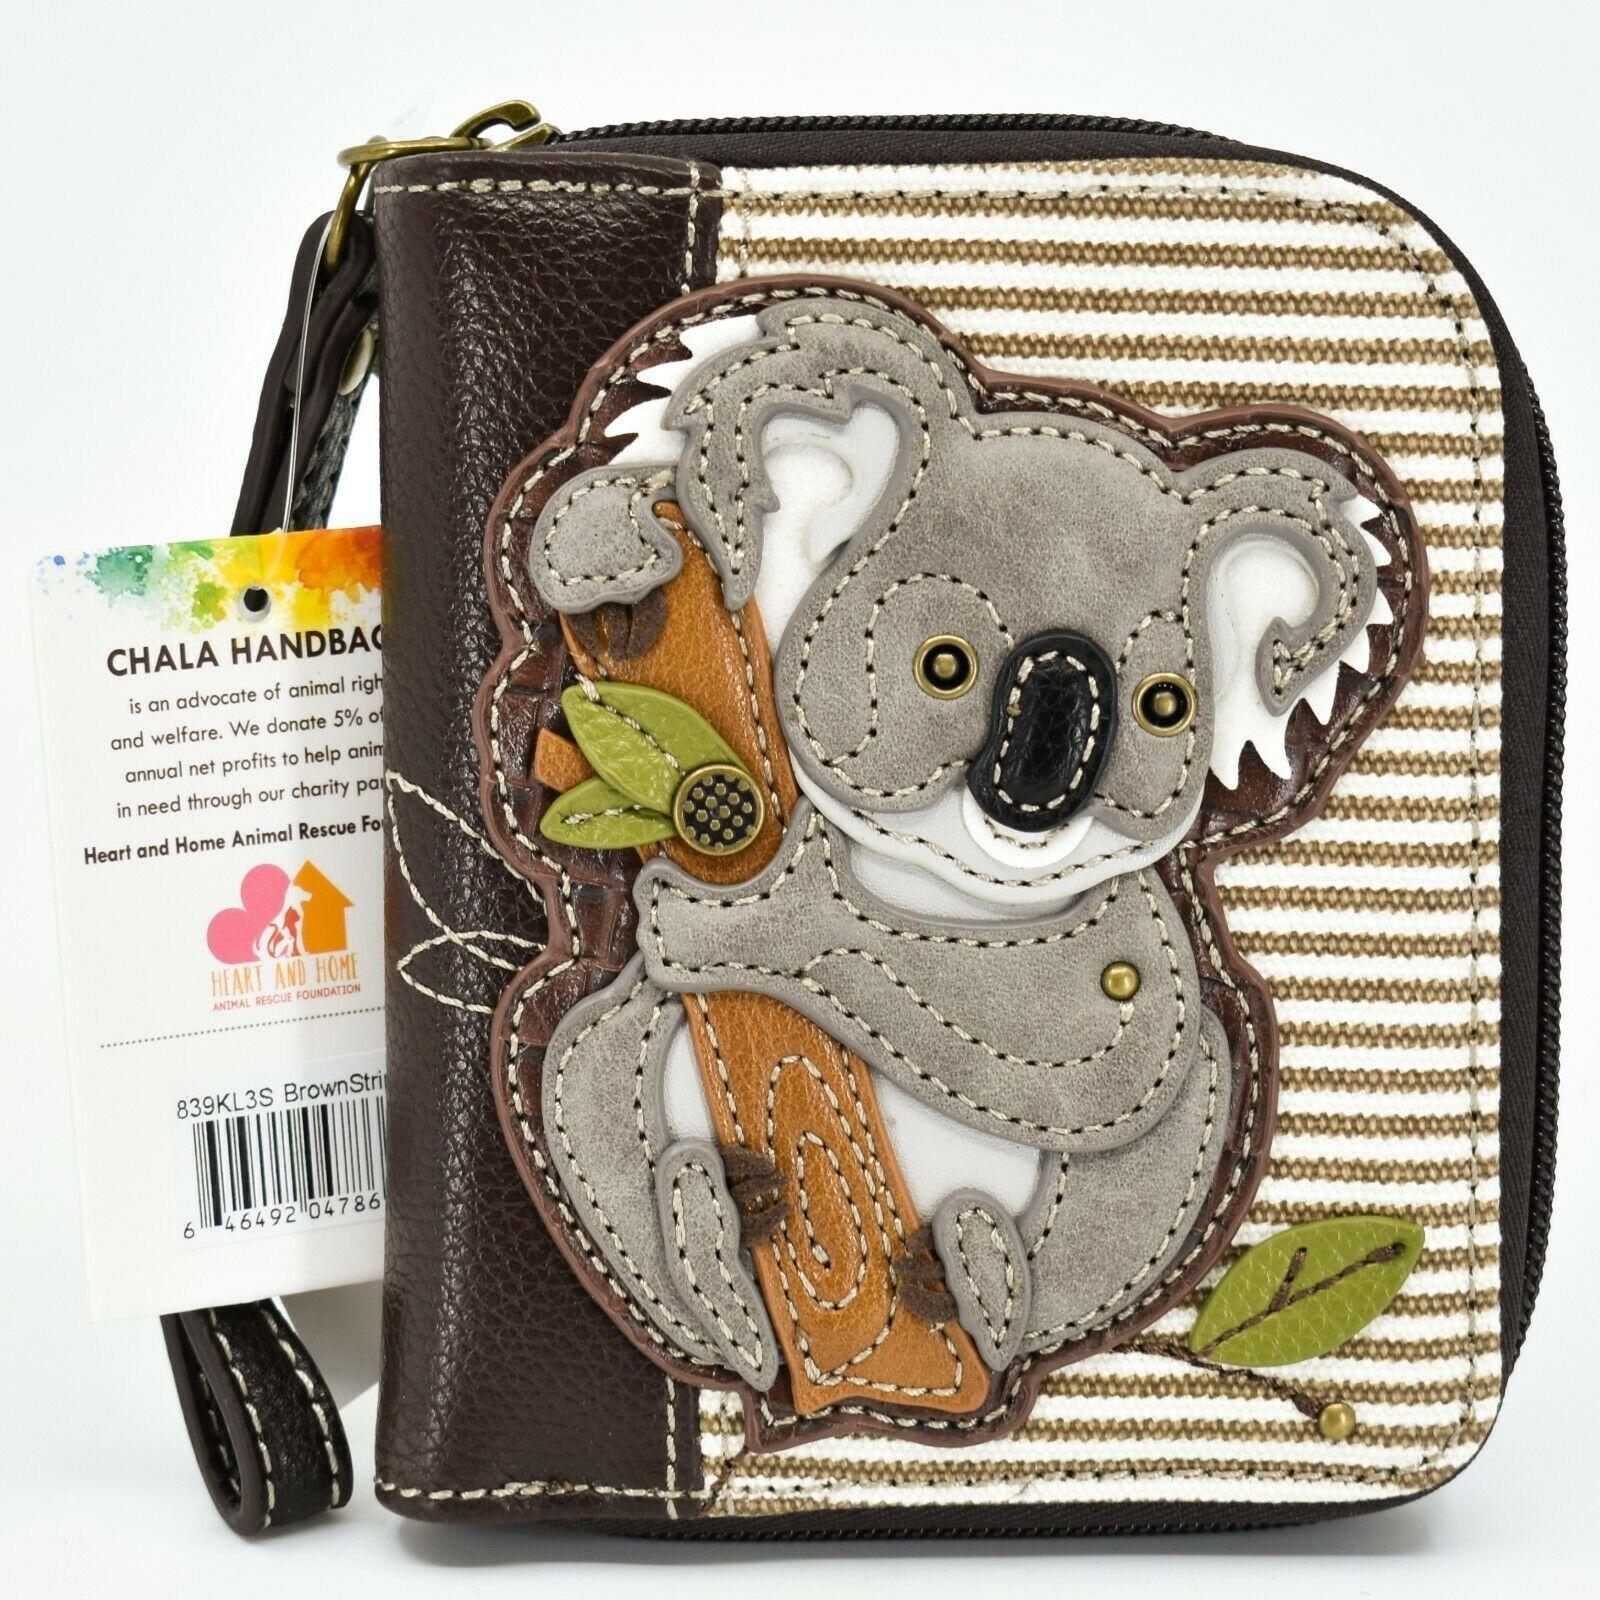 Chala Handbags Faux Leather Whimsical Koala Brown Zip Around Wristlet Wallet